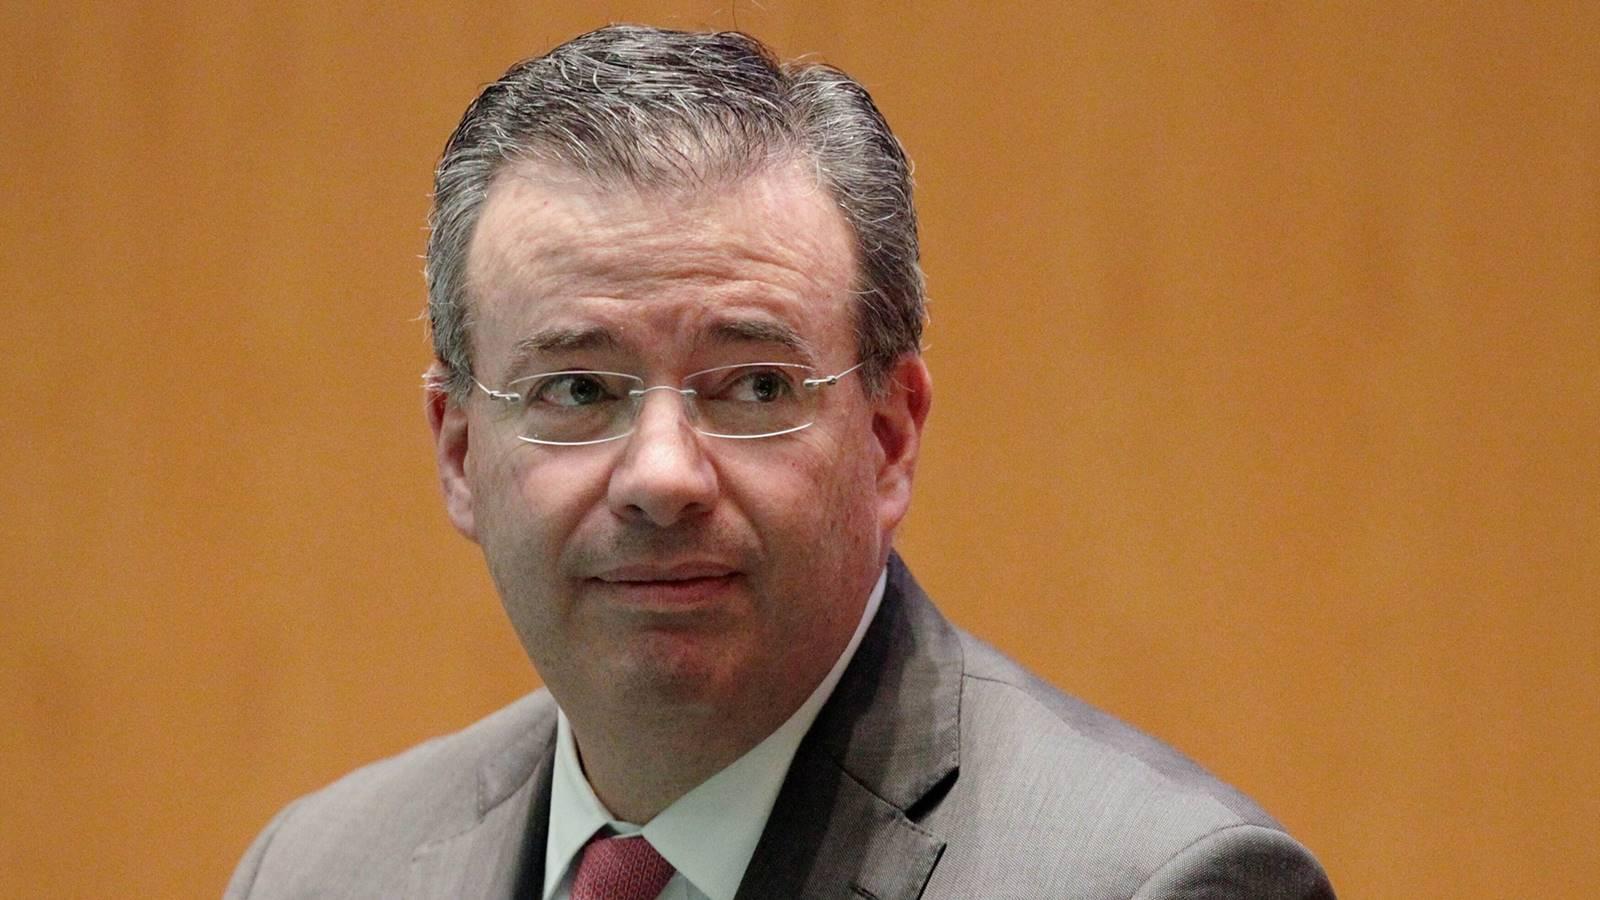 Caída de precios de materias primas complica a países emergentes endeudarse: Díaz de León